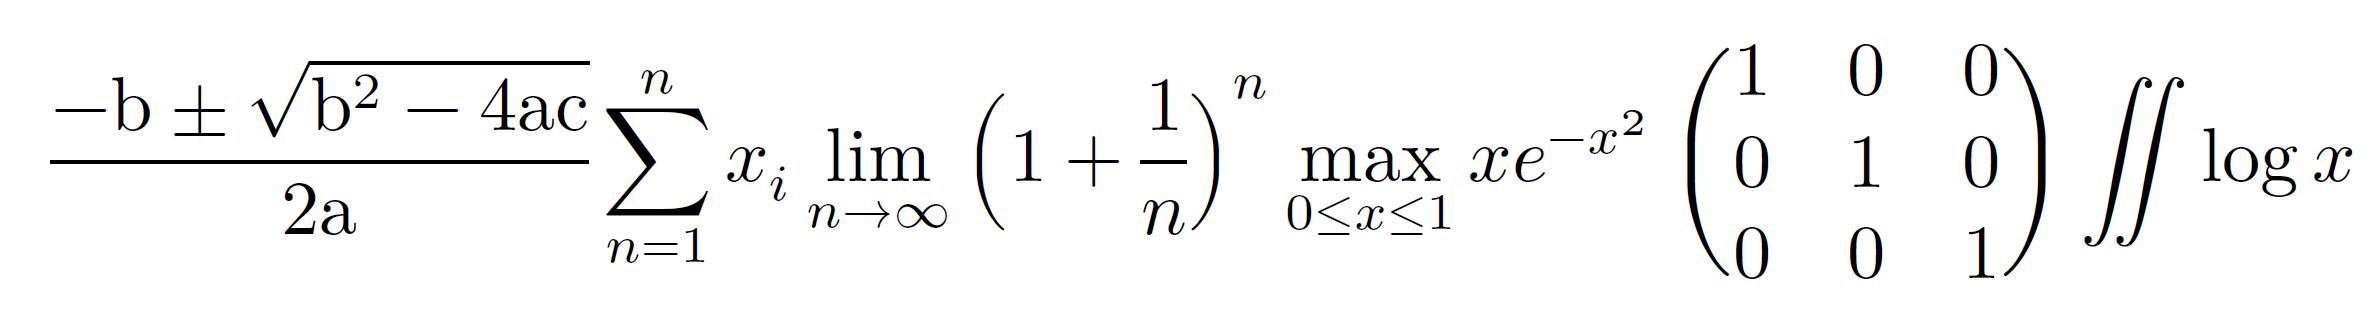 GitHub - LittleNewton/Replace_MathType: 提供一个基于